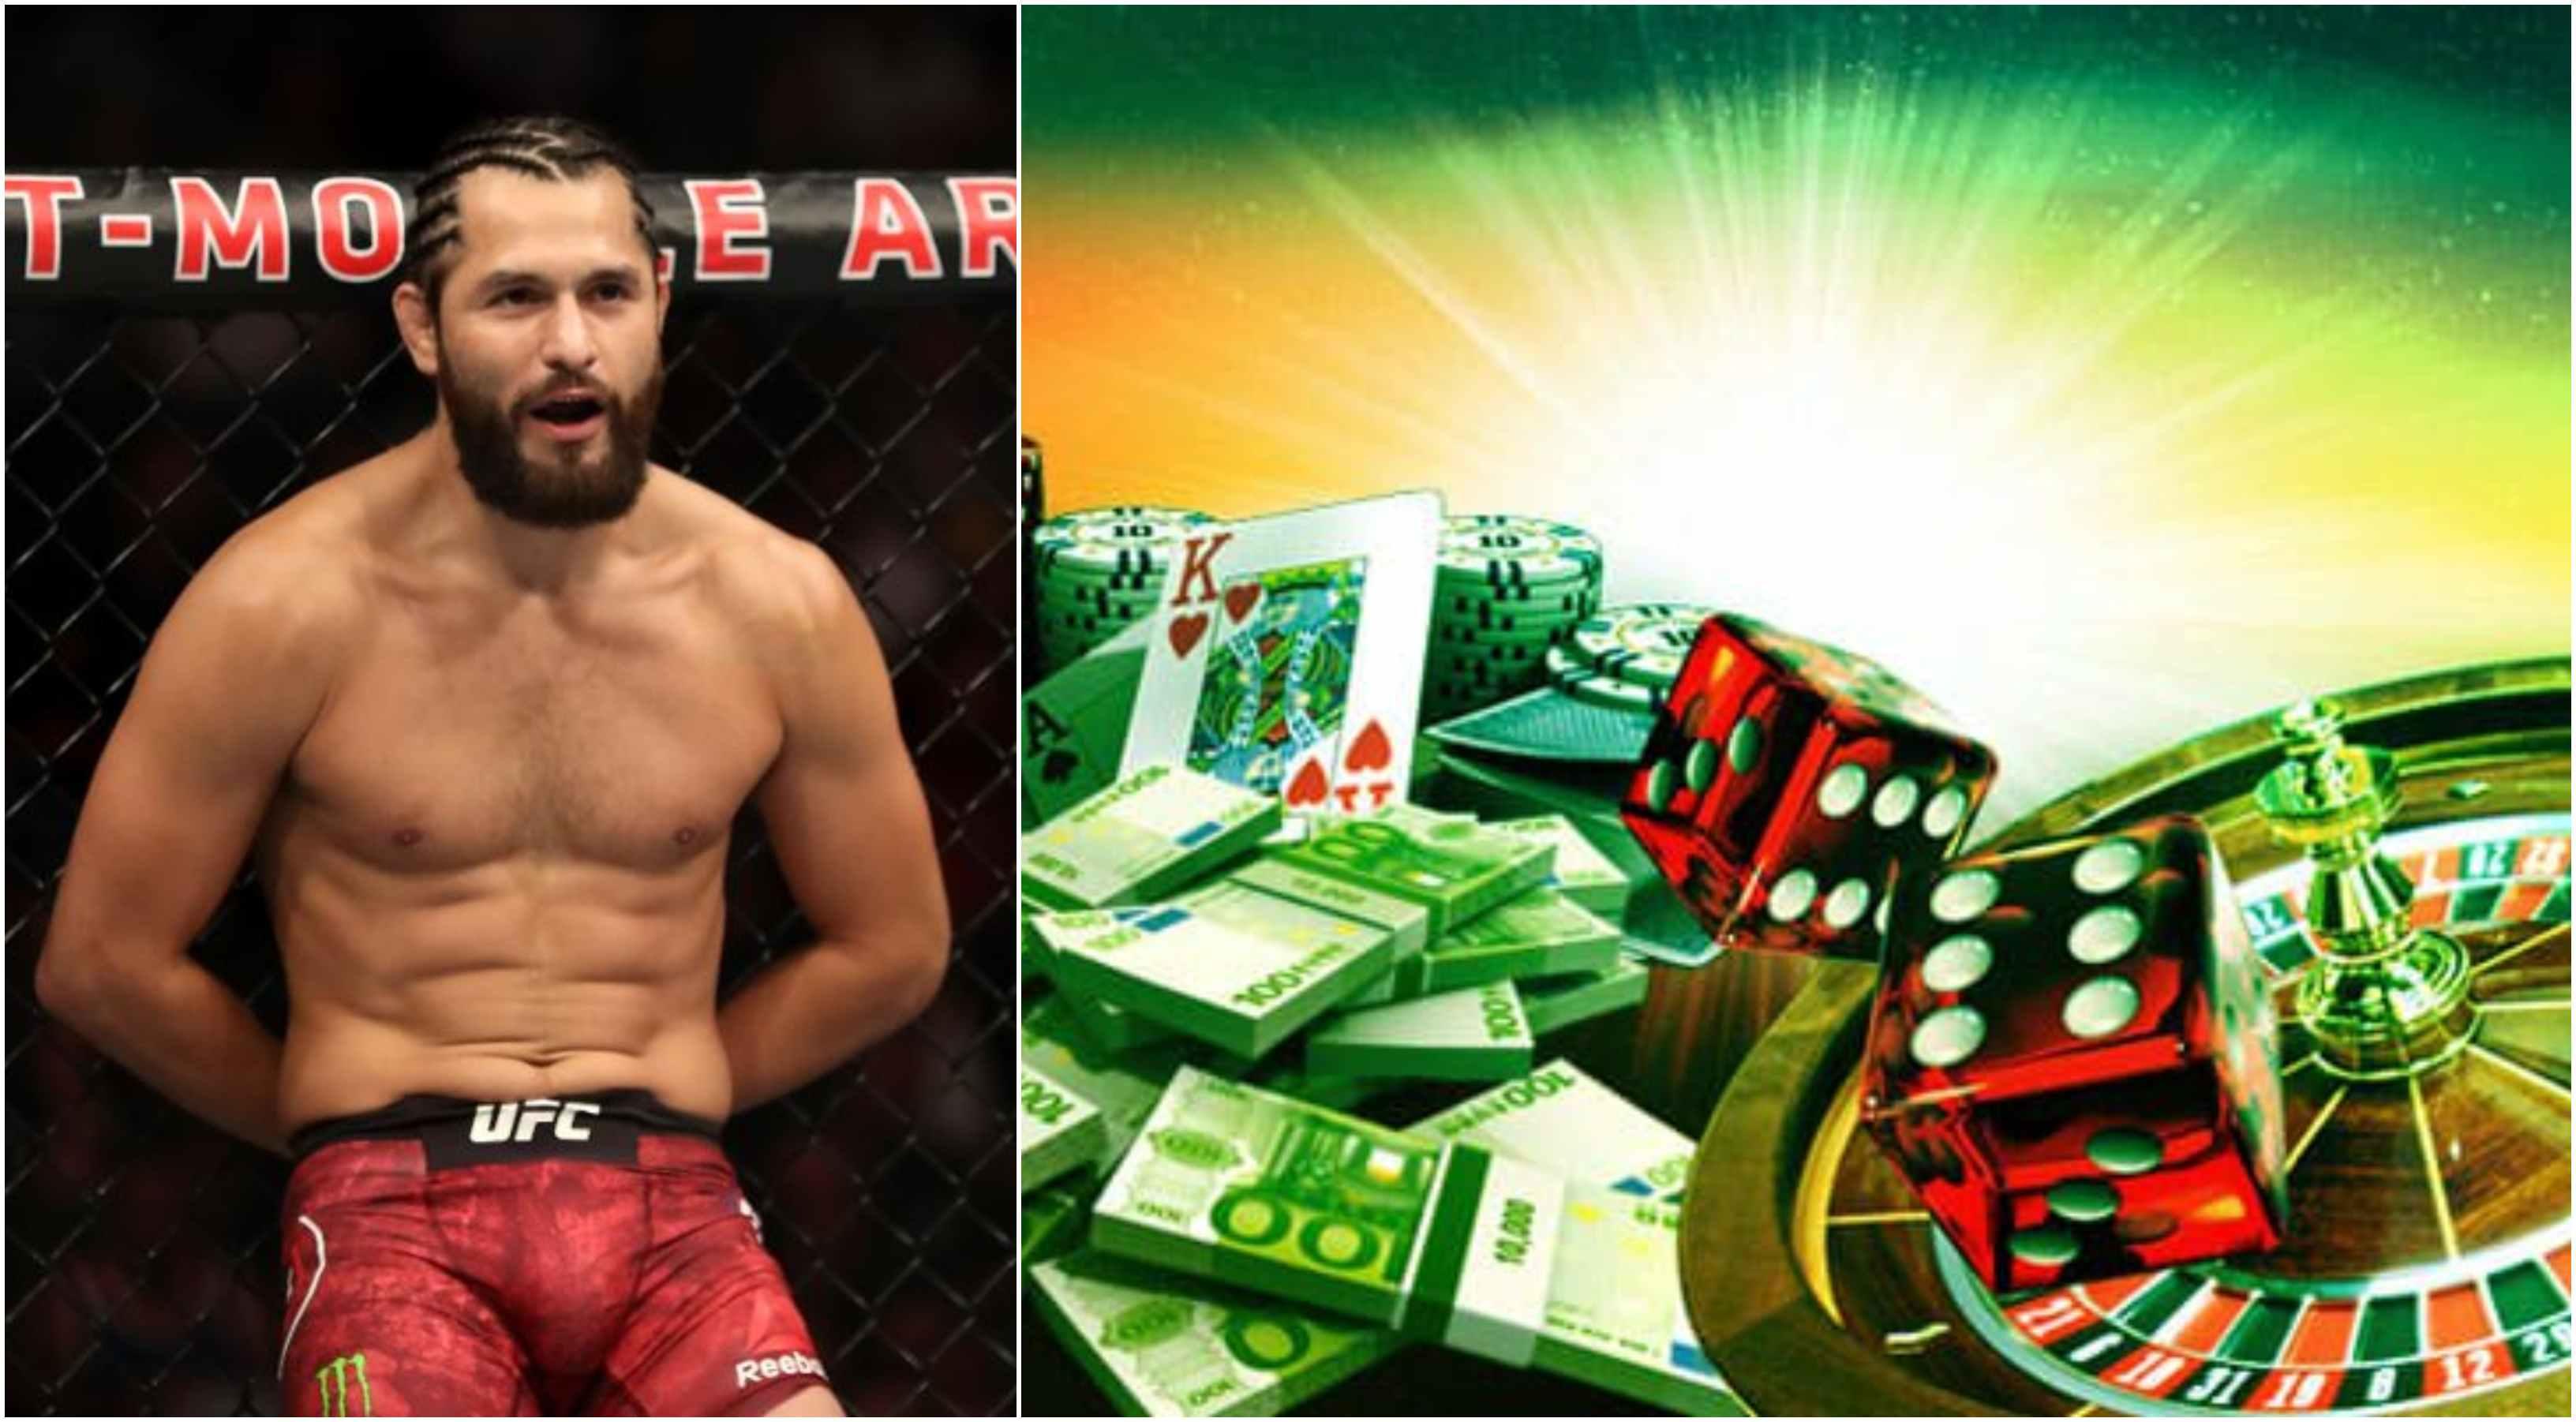 MMA fan in Las Vegas bets ₹21 Lakhs on Jorge Masvidal to defeat Nate Diaz - Masvidal